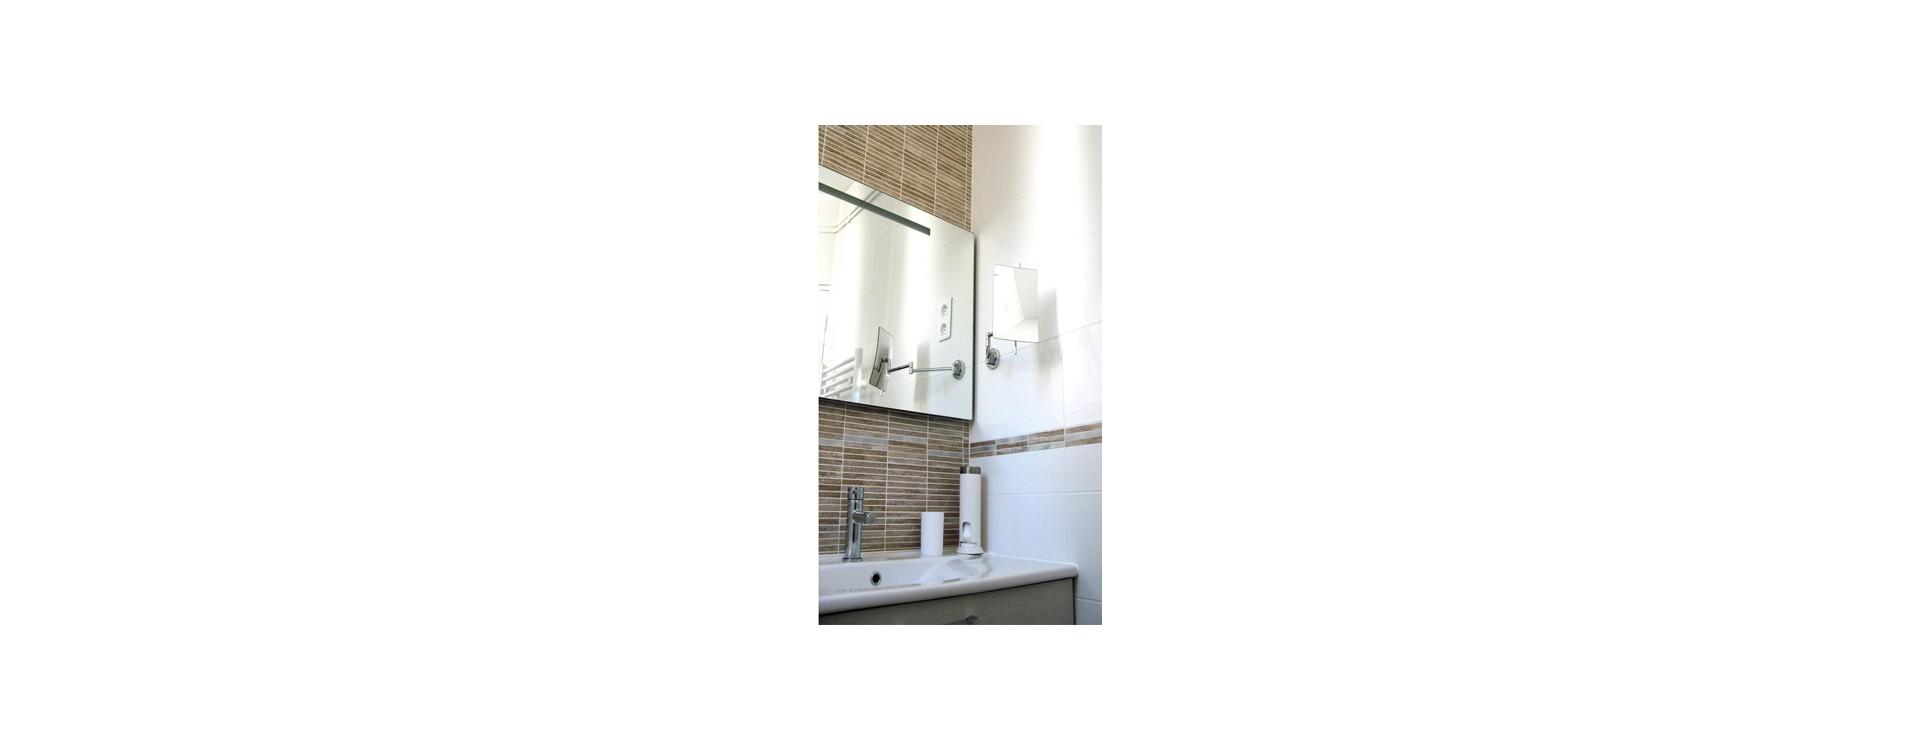 Cabine de douche textile galbobain pour baignoire galbobain - Textile salle de bain ...